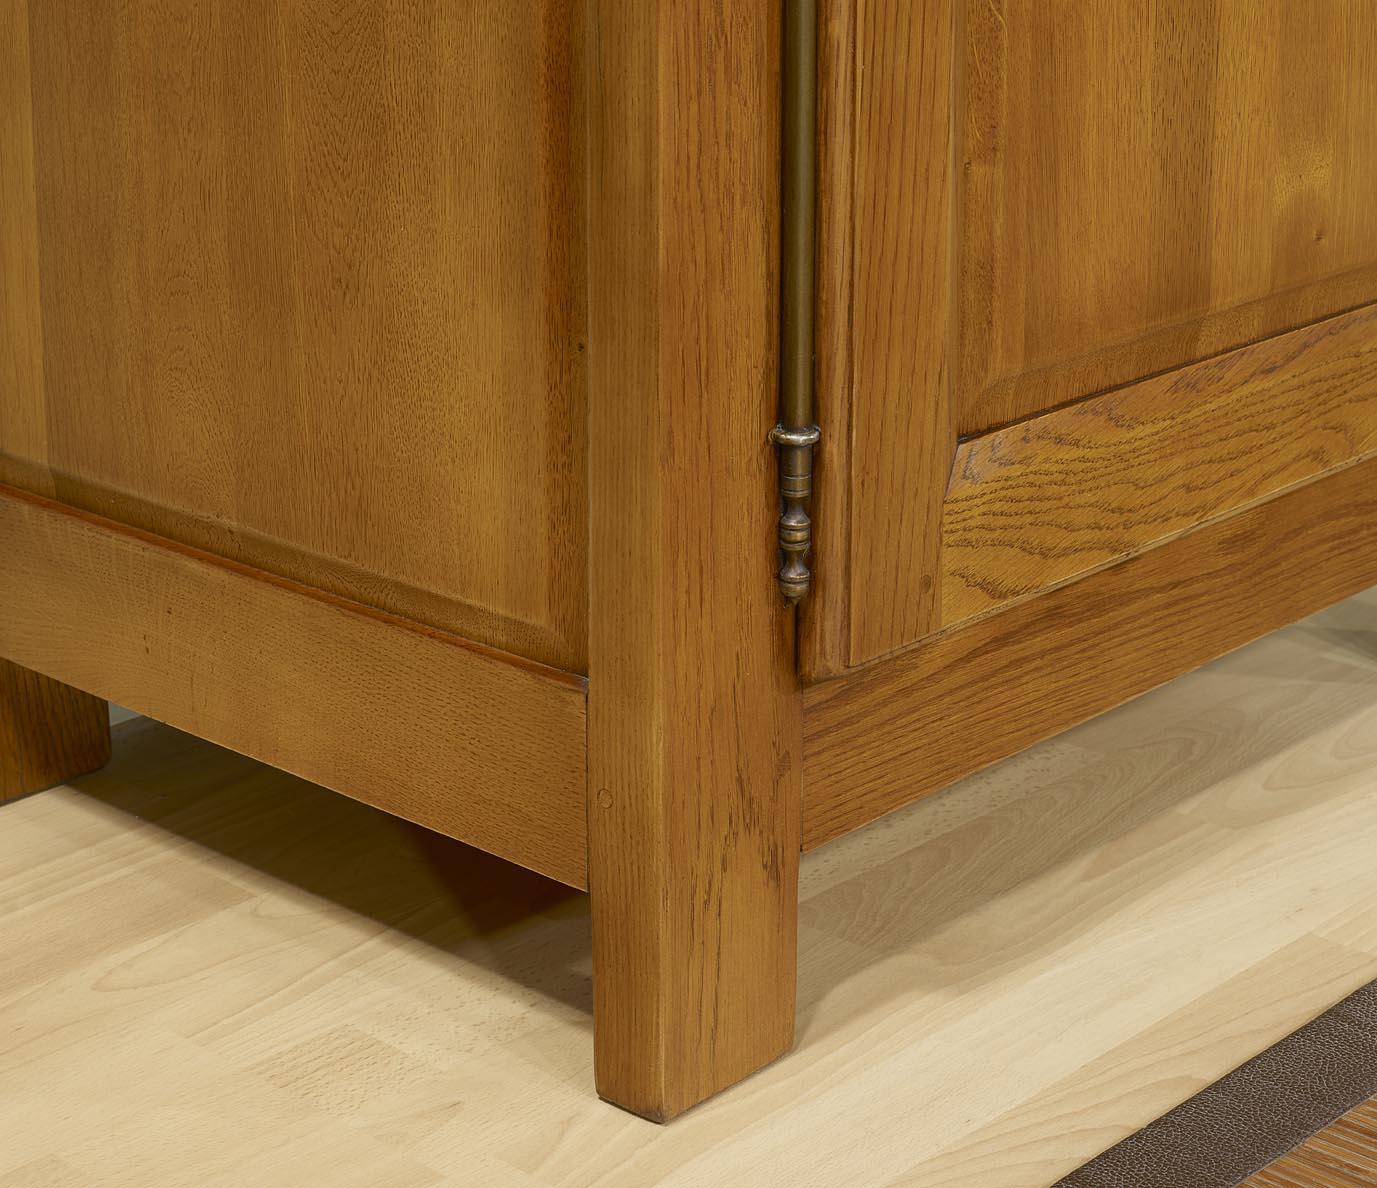 confiturier 1 porte 1 tiroir en ch ne massif de style campagnard 1 seul disponible finition. Black Bedroom Furniture Sets. Home Design Ideas